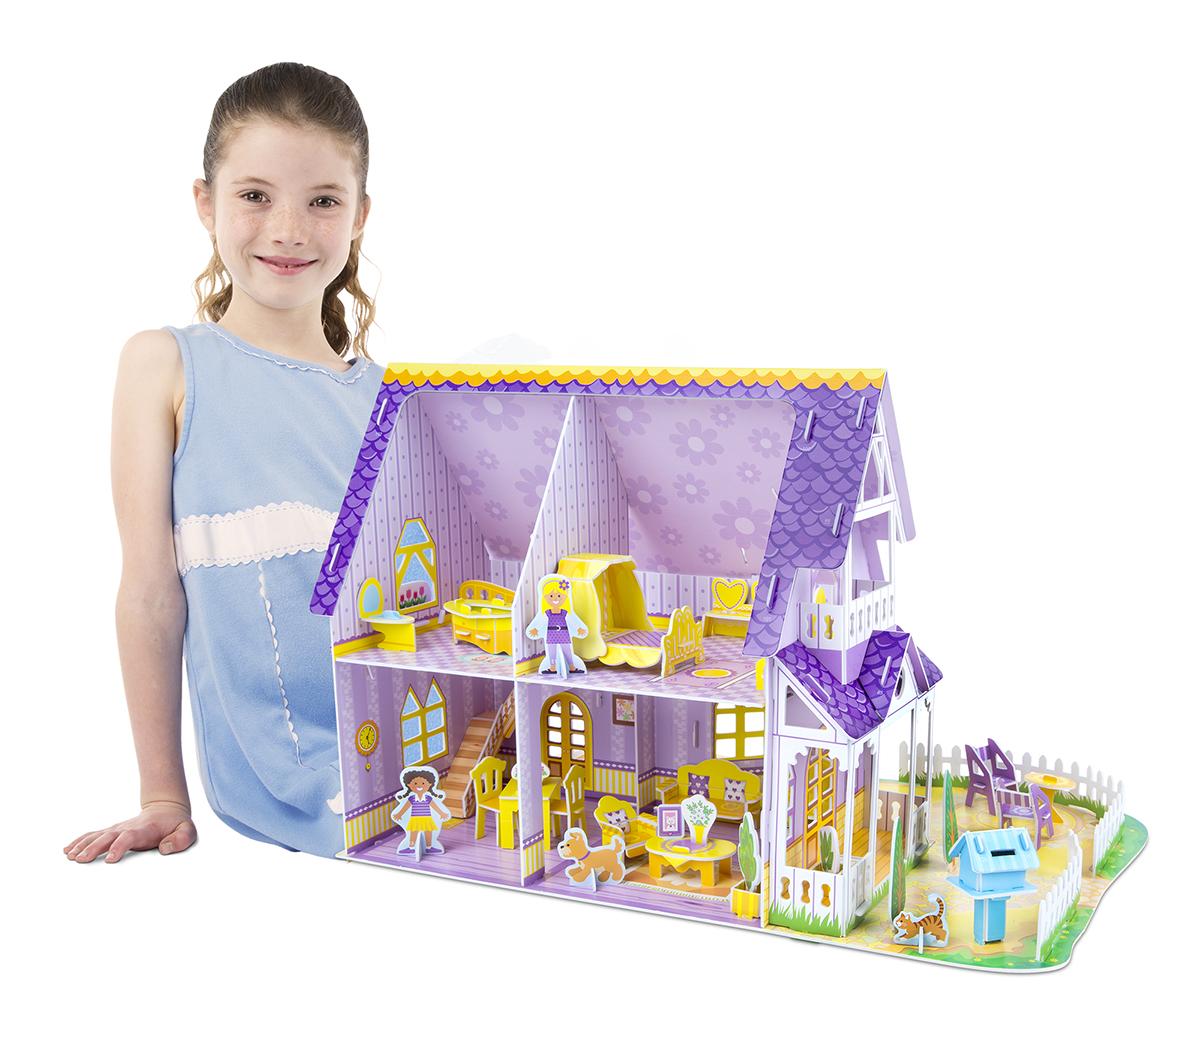 Melissa & Doug Pretty Purple Dollhouse 3D Puzzle & Dollhouse In One